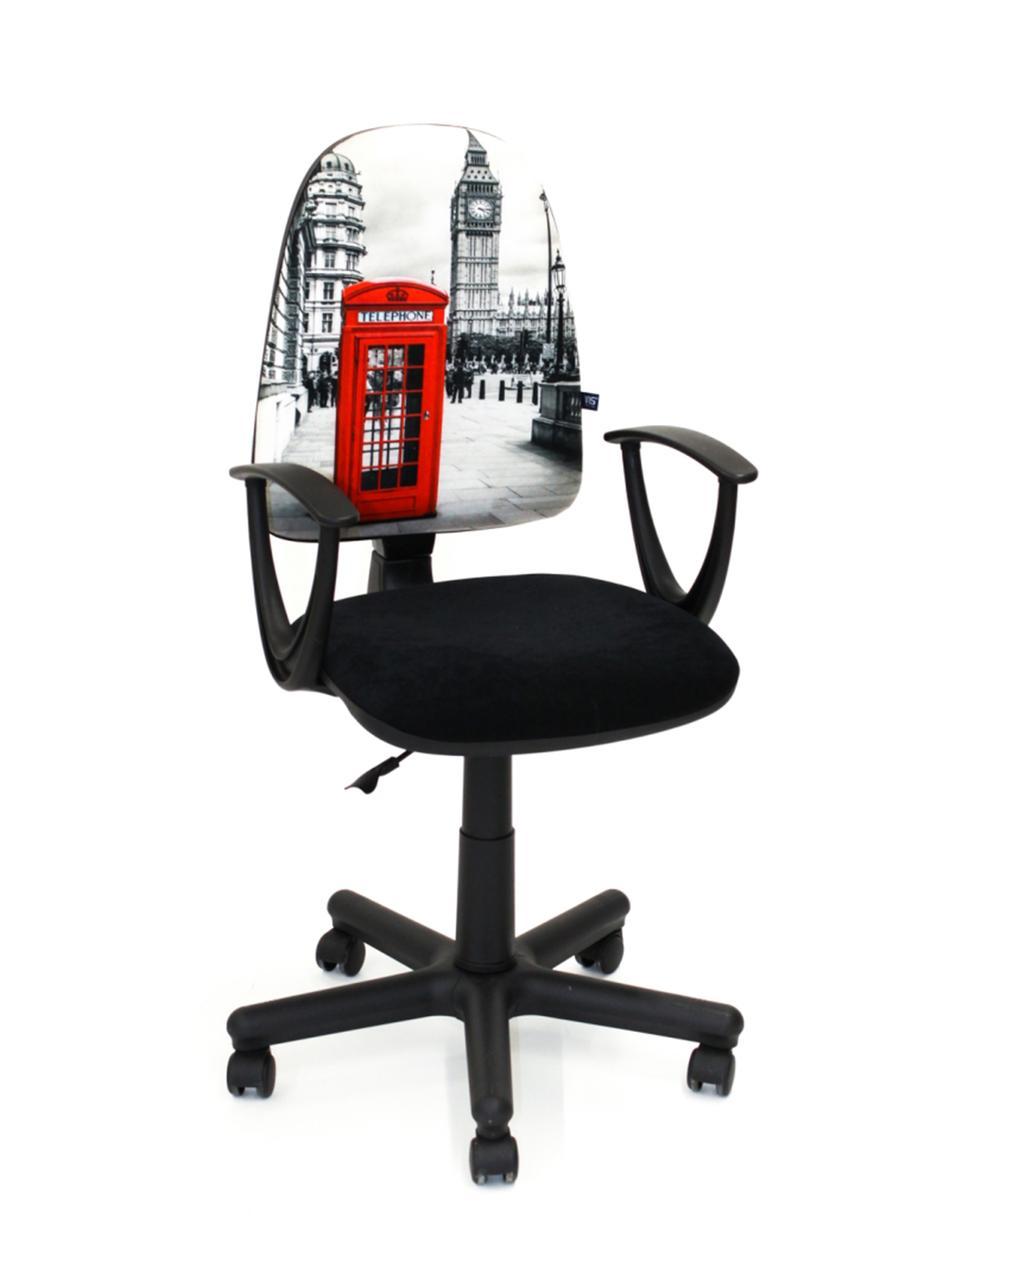 Детское компьютерное кресло FALCON GTP MF A TA 2 от Nowy Styl